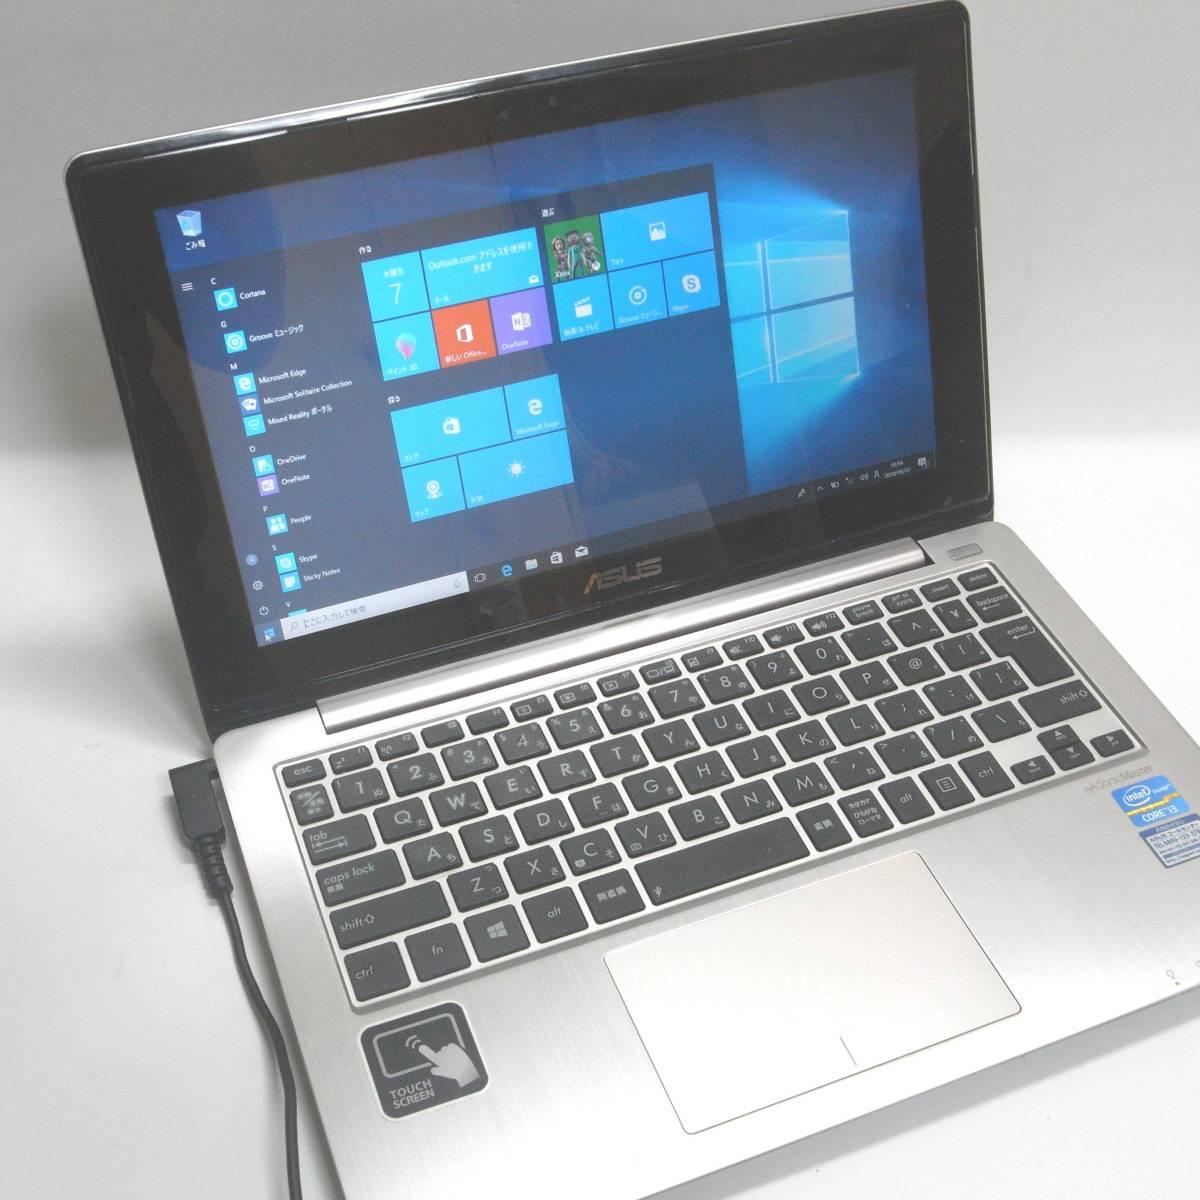 ASUS VivoBook X202E 送料無料 Core i3 1.8GHz 11インチタッチパネル液晶 メモリ4GB HDD500GB WIN10 #2